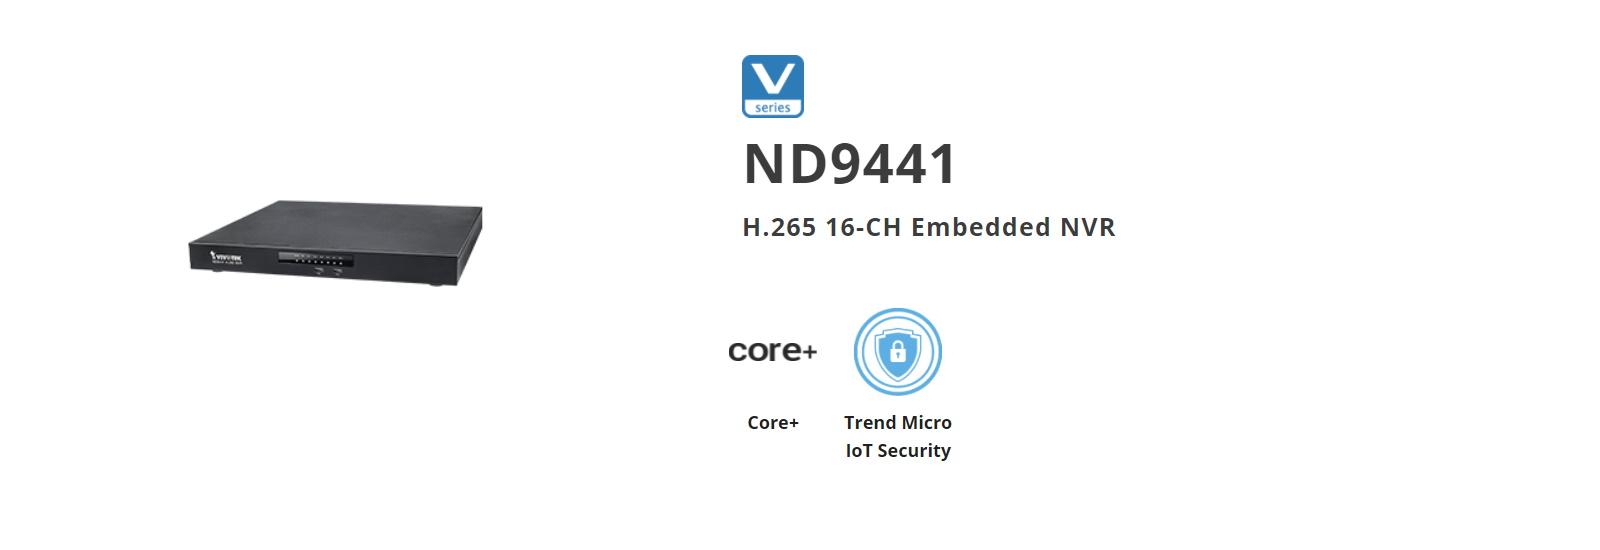 ND9441 | VIVOTEK NVR | H 265/H 264 | 16 Channel | 4 HDD